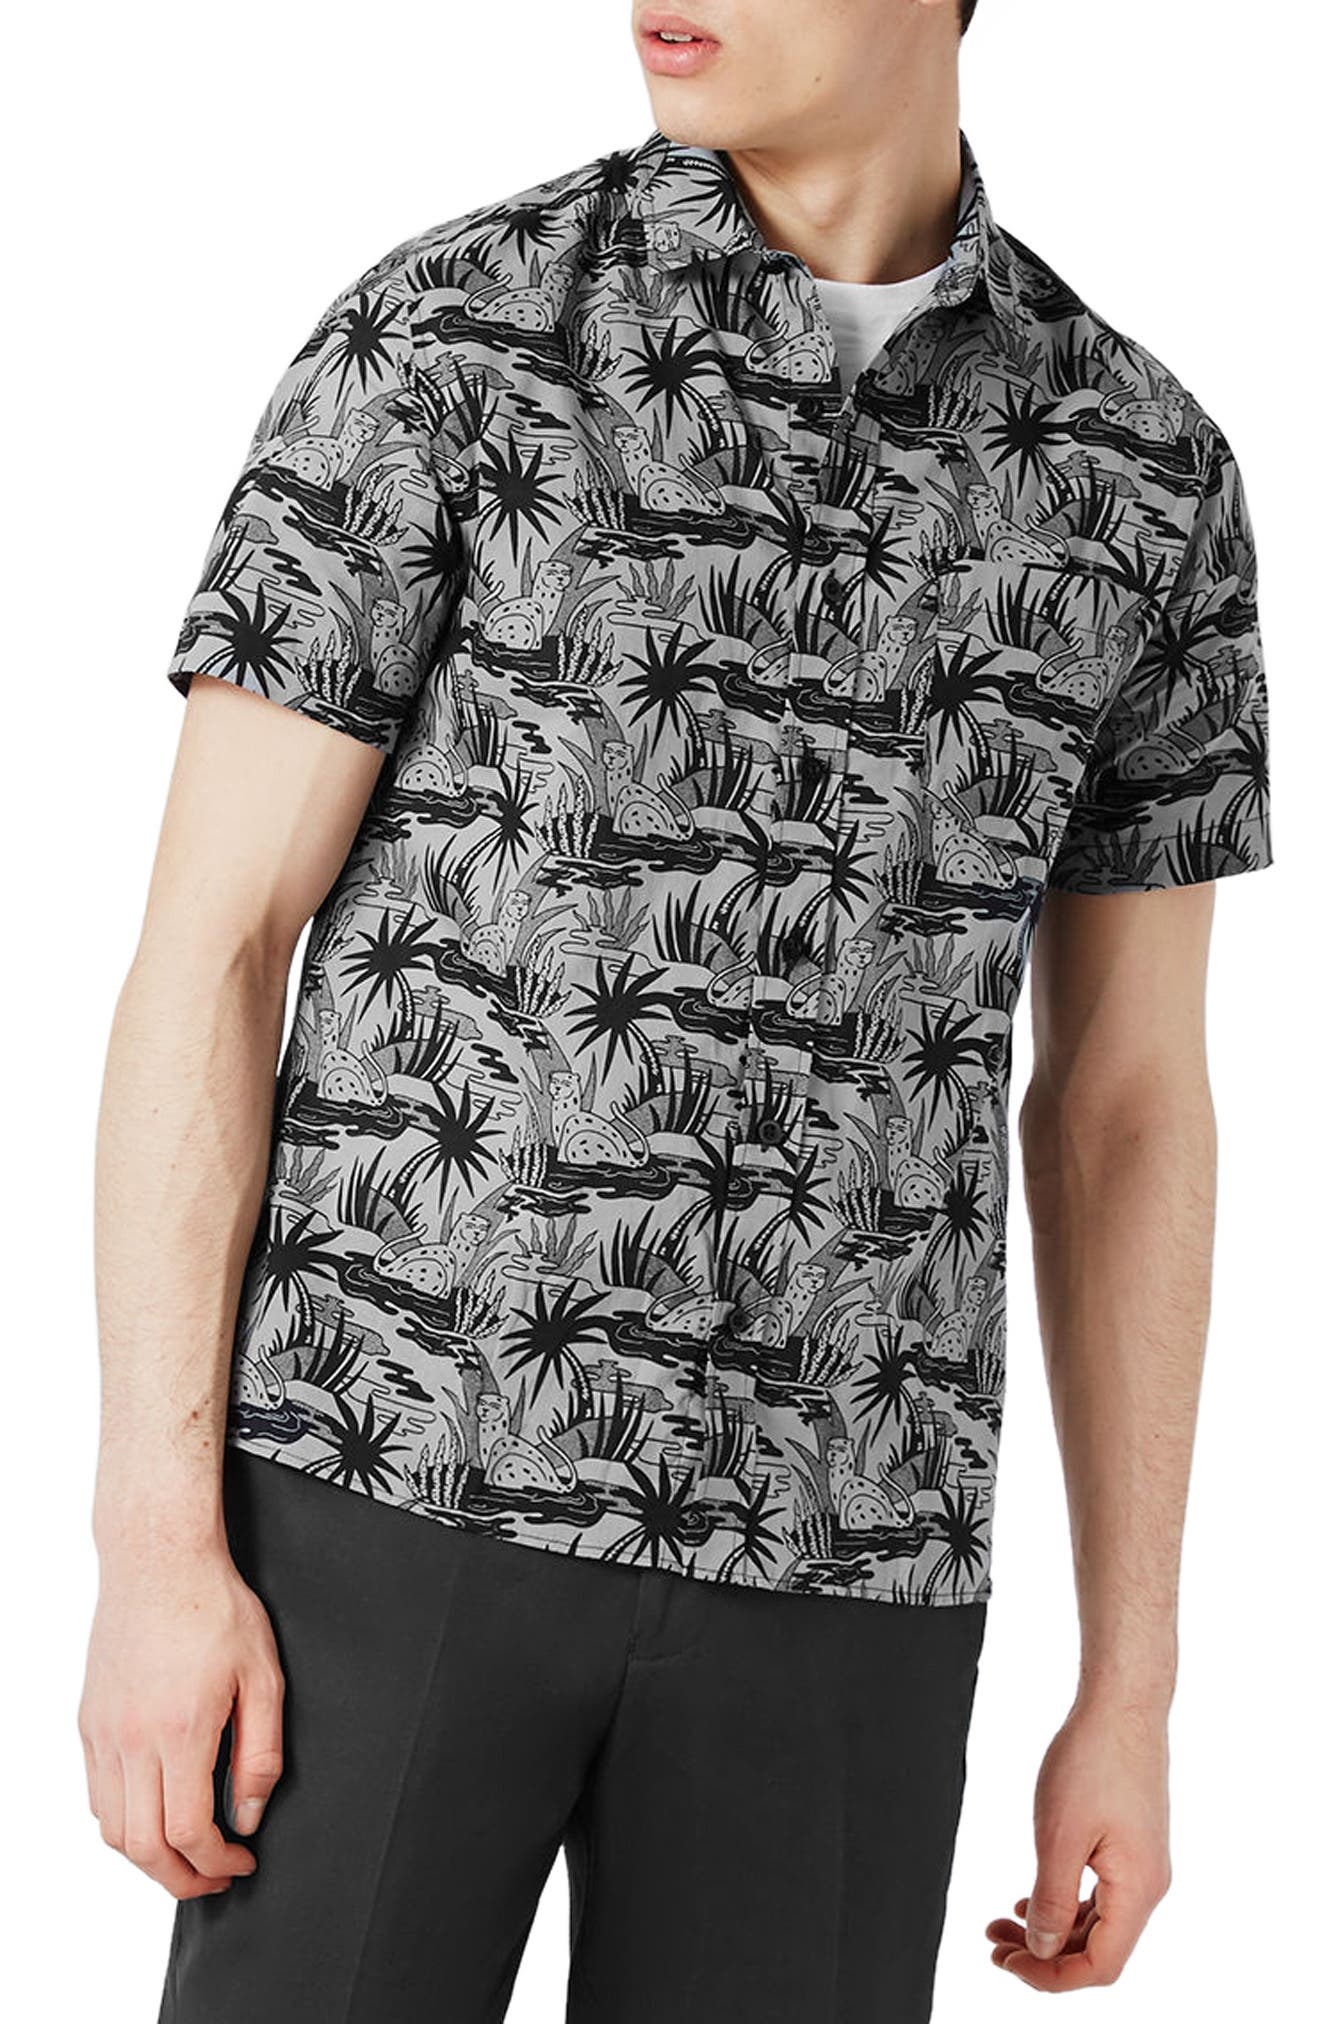 Topman Cheetah Print Shirt